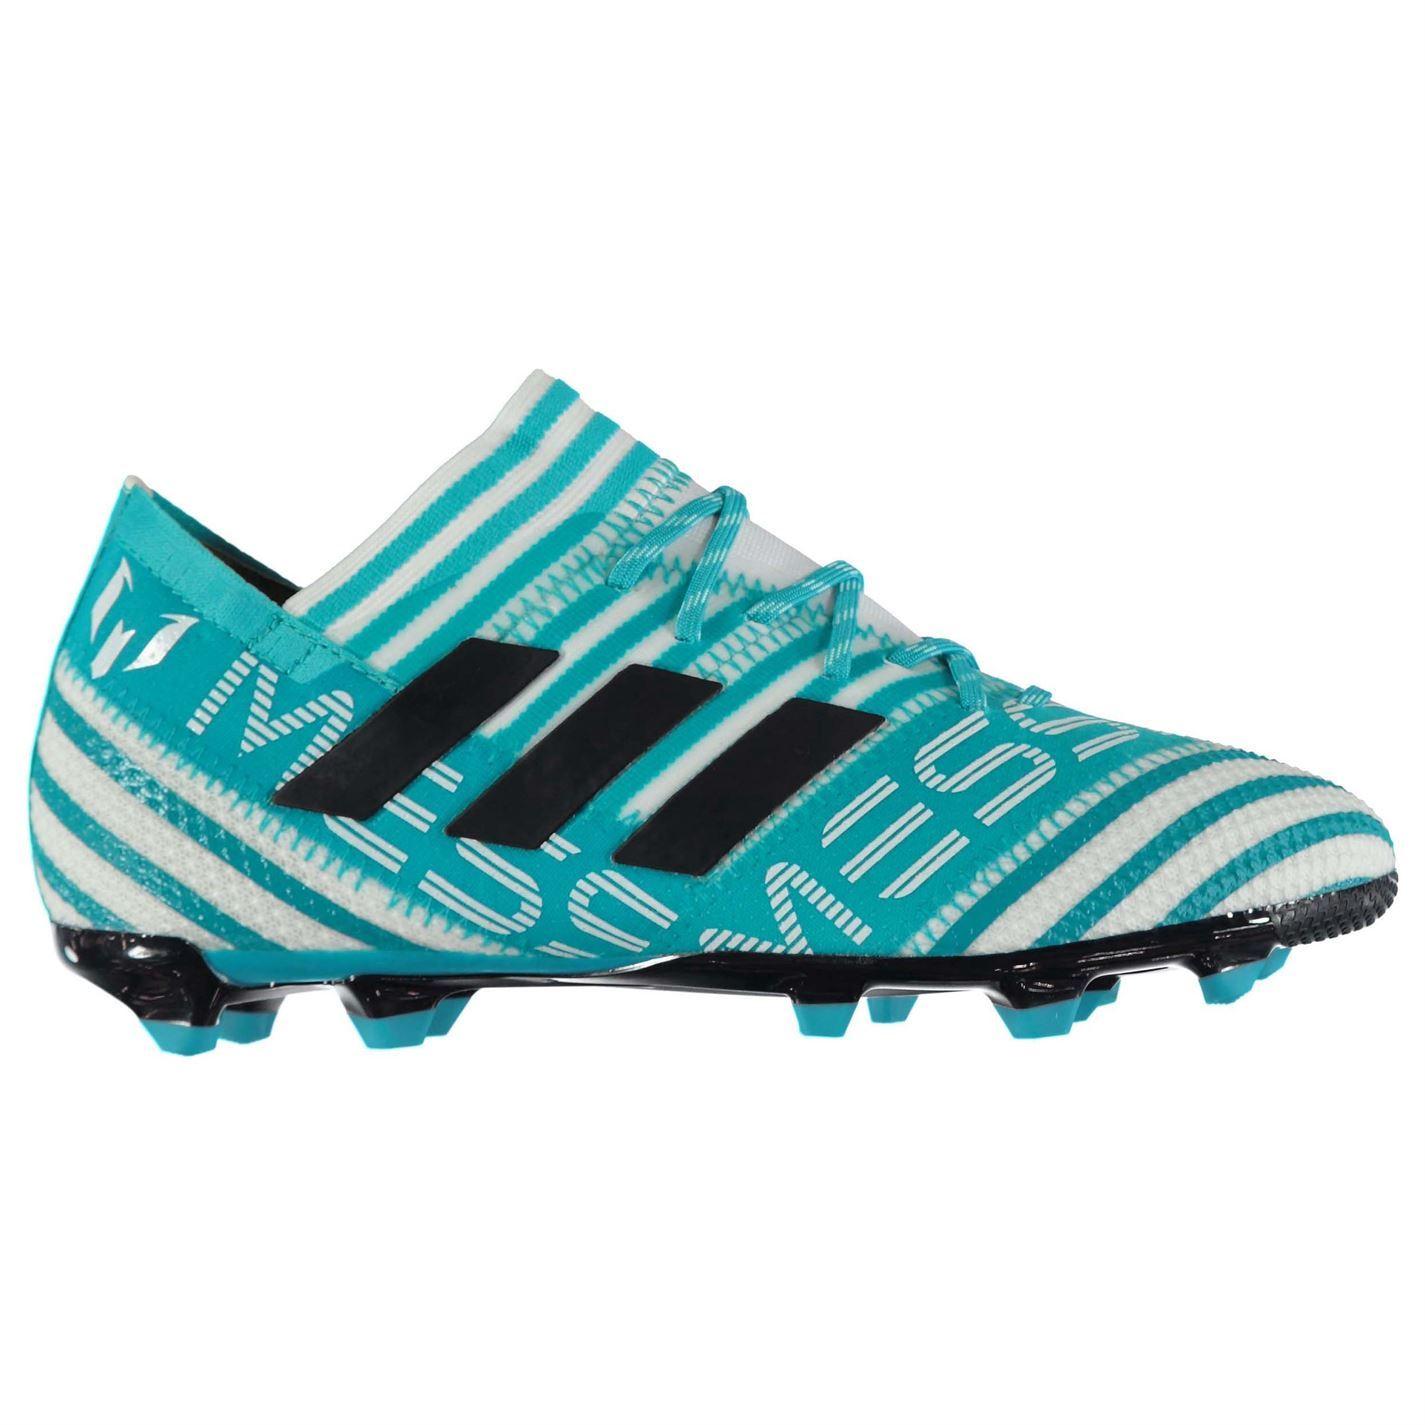 ea5ff86ed ... adidas Nemeziz Messi 17.1 Firm Ground Football Boots Juniors Blue  Soccer Cleats ...